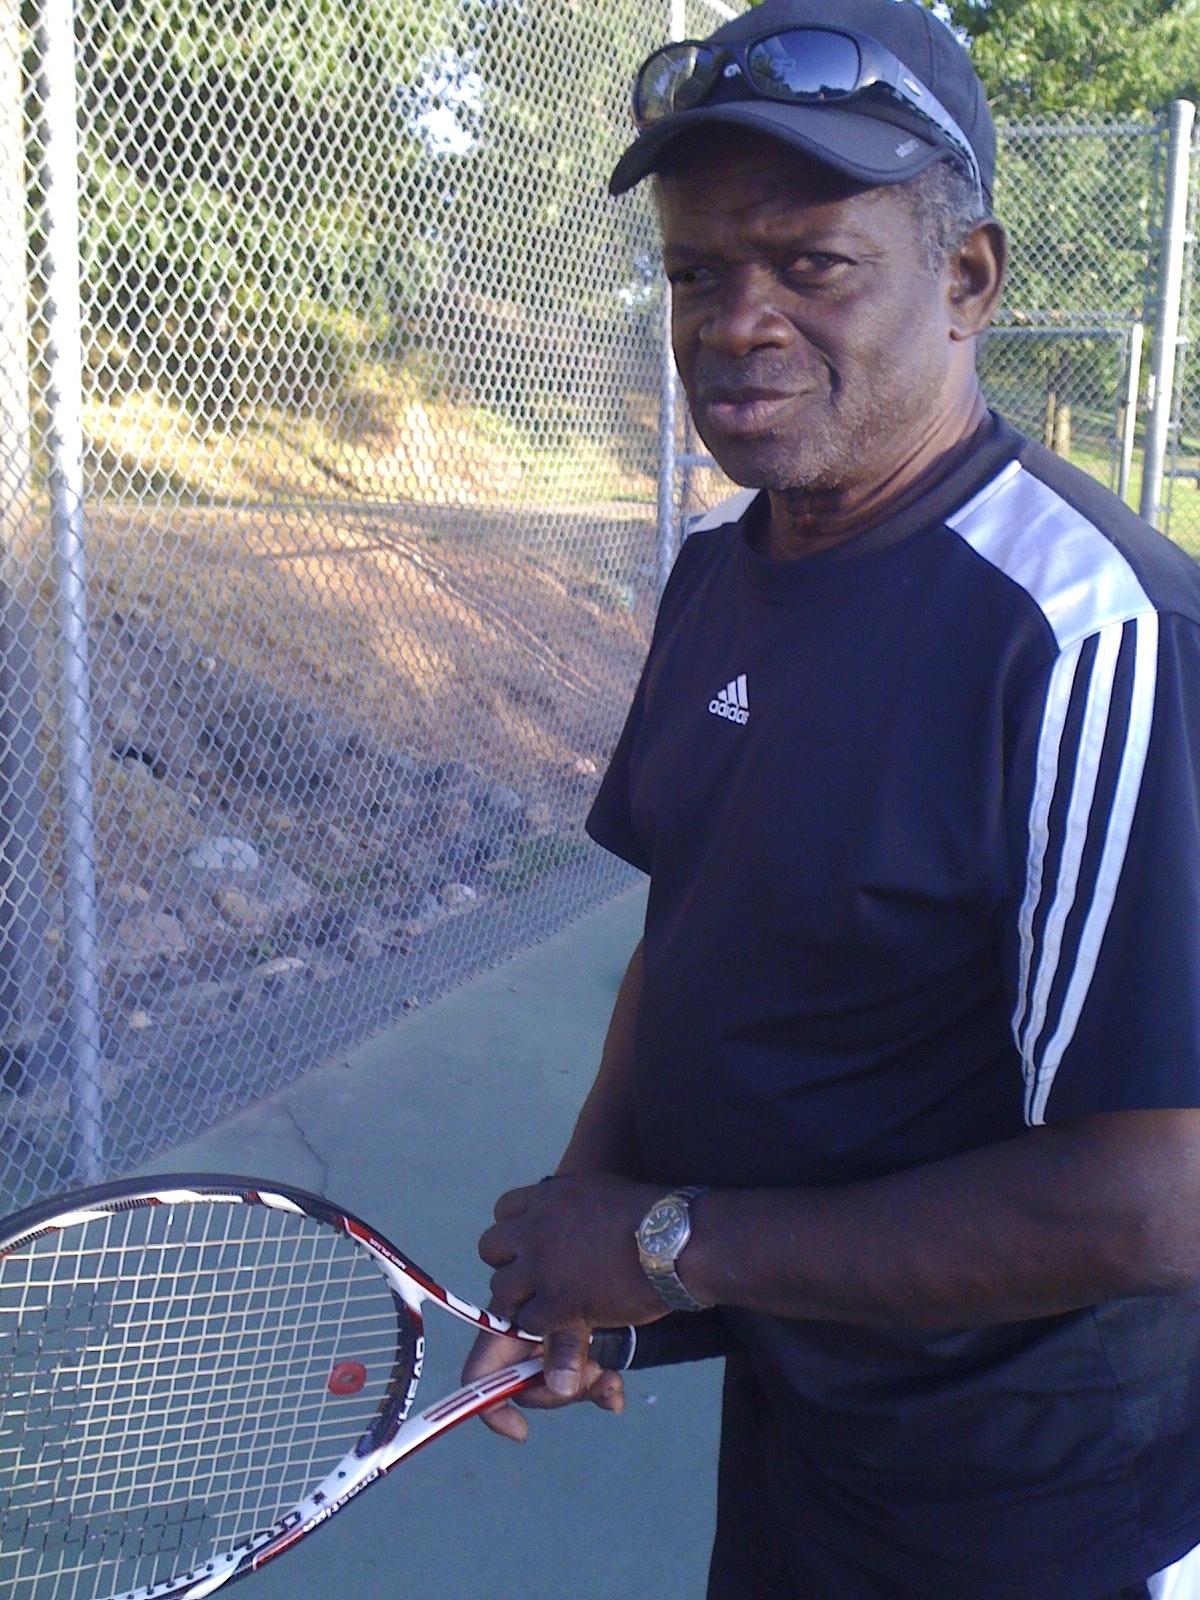 Willie B. teaches tennis lessons in Rancho Cordova, CA